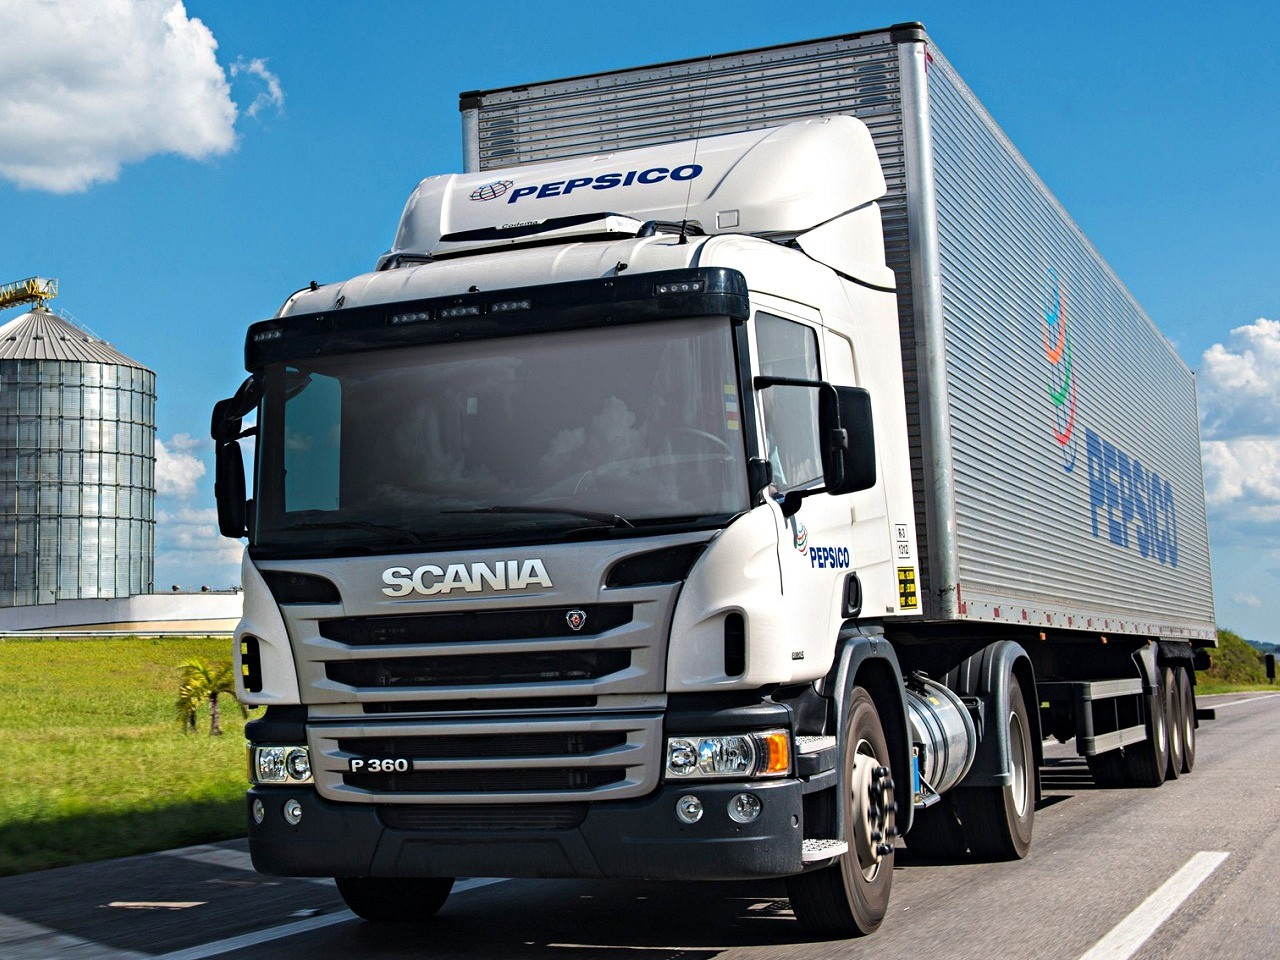 Ремонт 2-х опорного карданного вала Scania P360